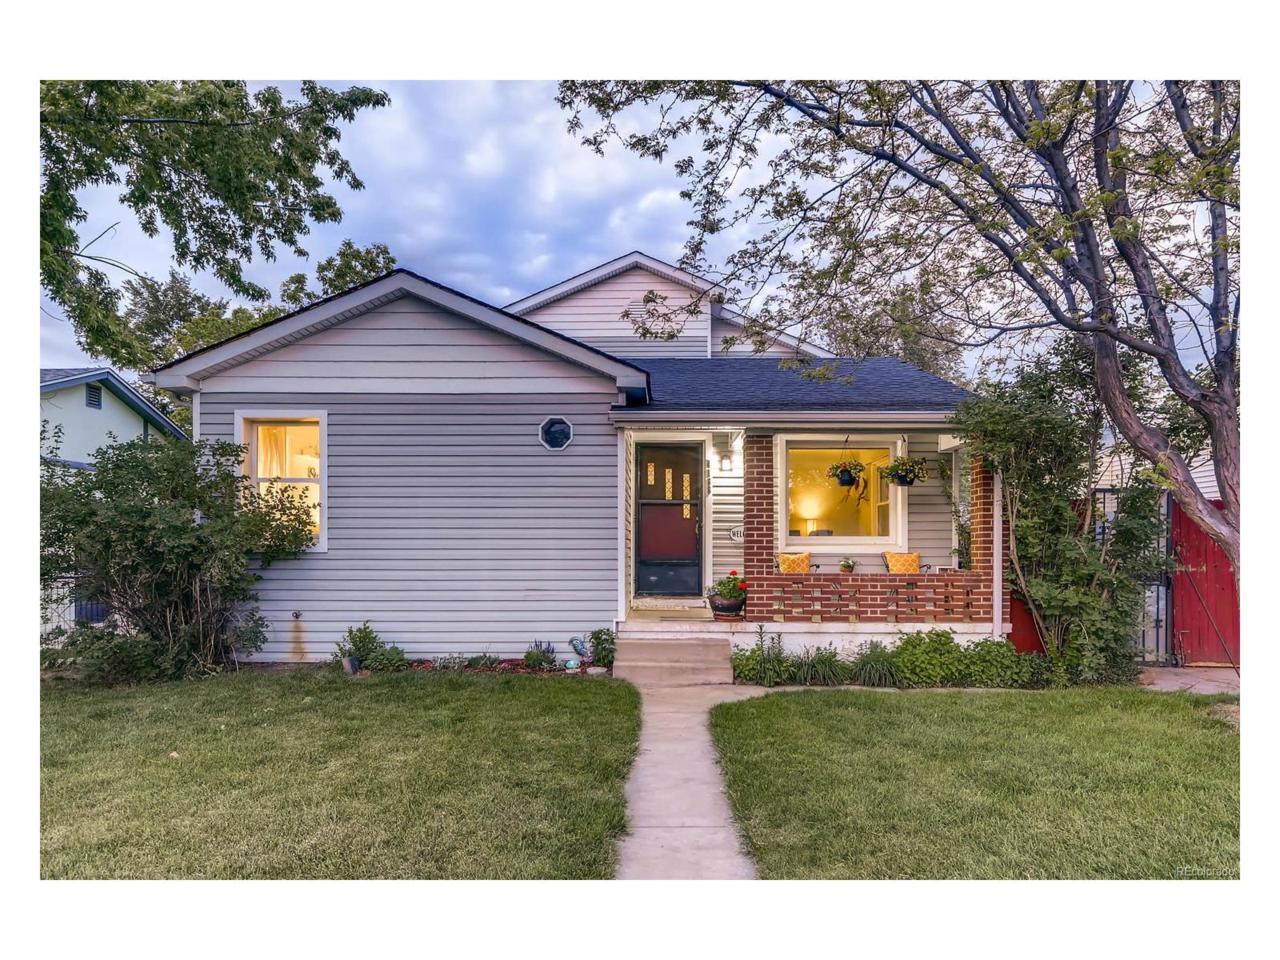 4188 S Washington Street, Englewood, CO 80113 (MLS #9338802) :: 8z Real Estate